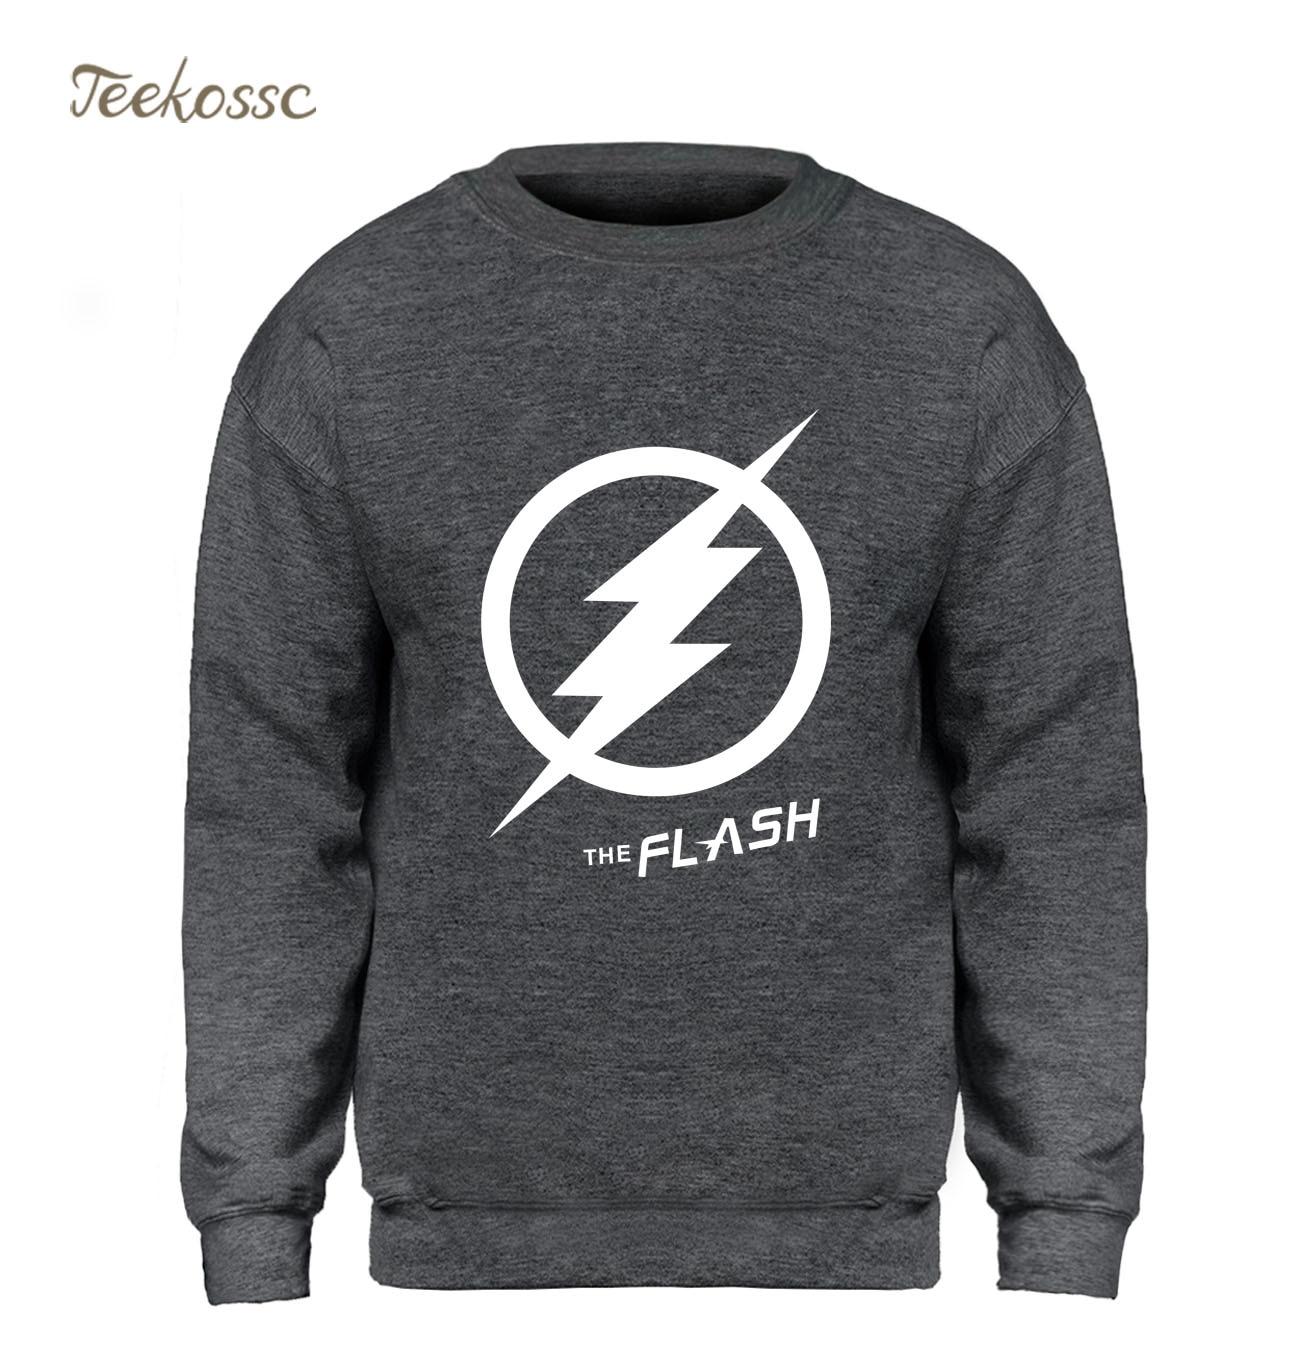 The Big Bang Theory Hoodie Men The Flash Sweatshirt Winter Autumn Fleece Sportswear Hipster Graphics Design Slim Fit Sweatshirts